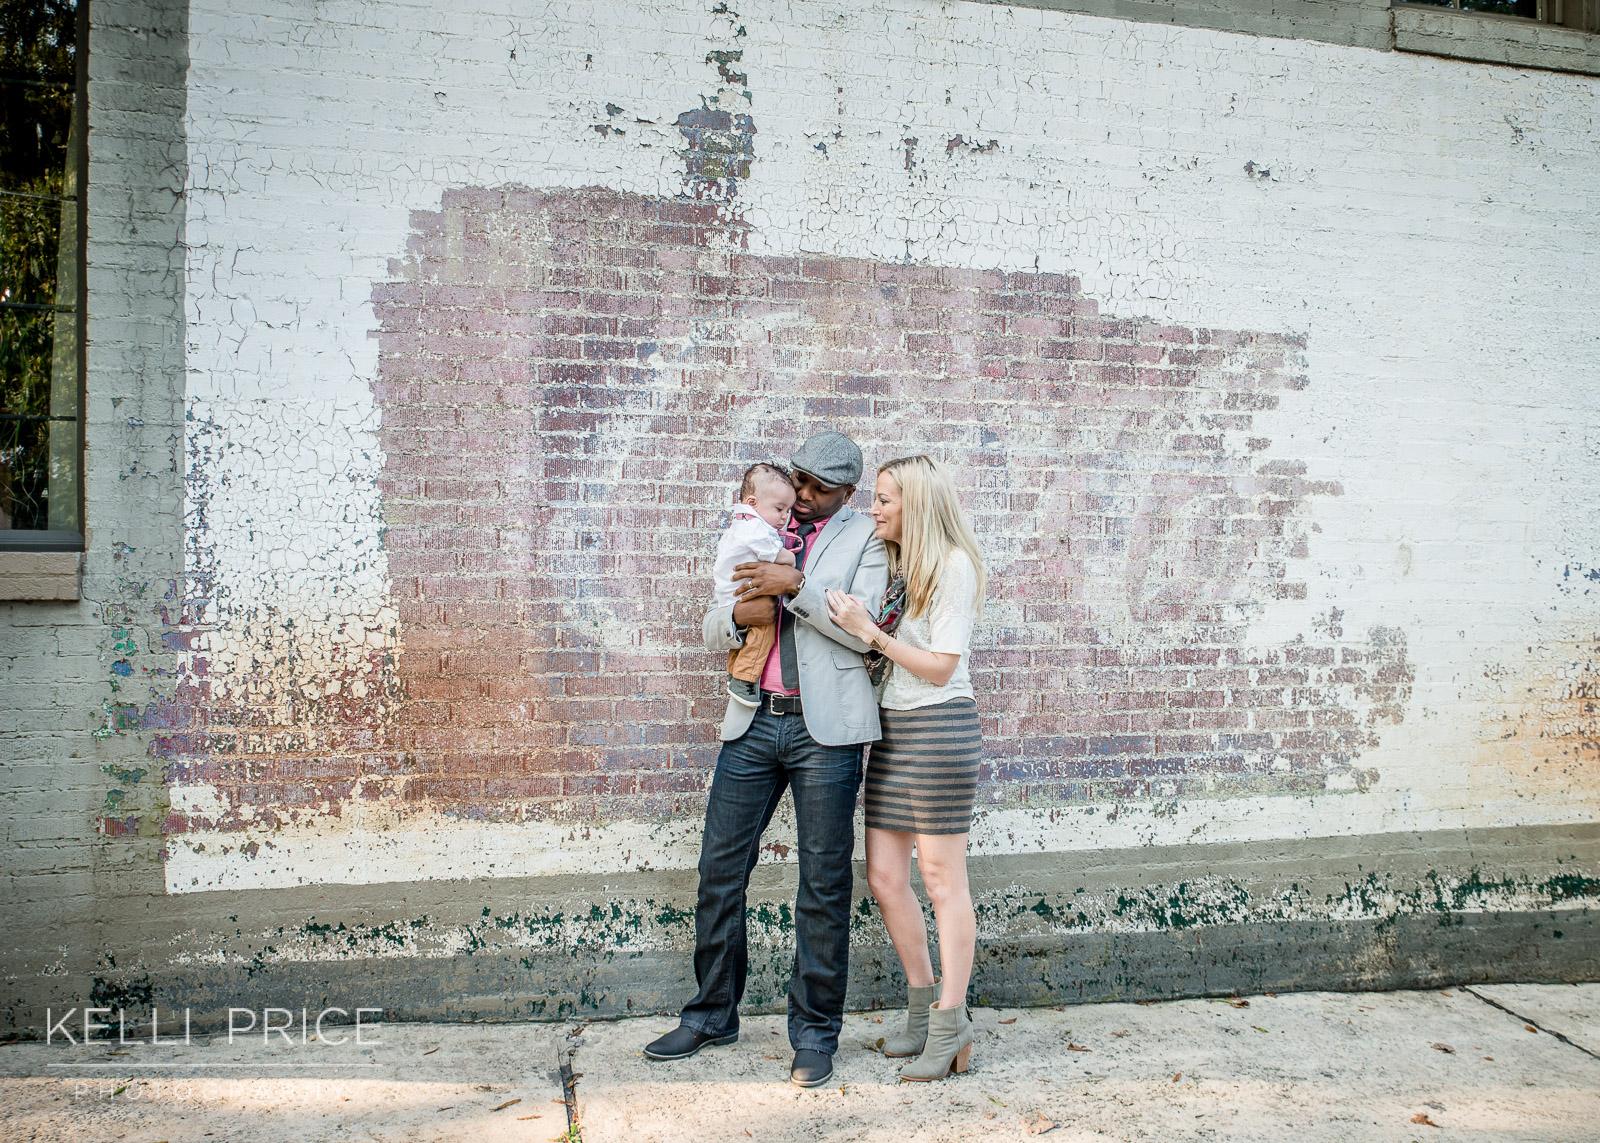 Urban_CocaColaWall_Family_Photography_Atlanta_KelliPricePhotography.jpg